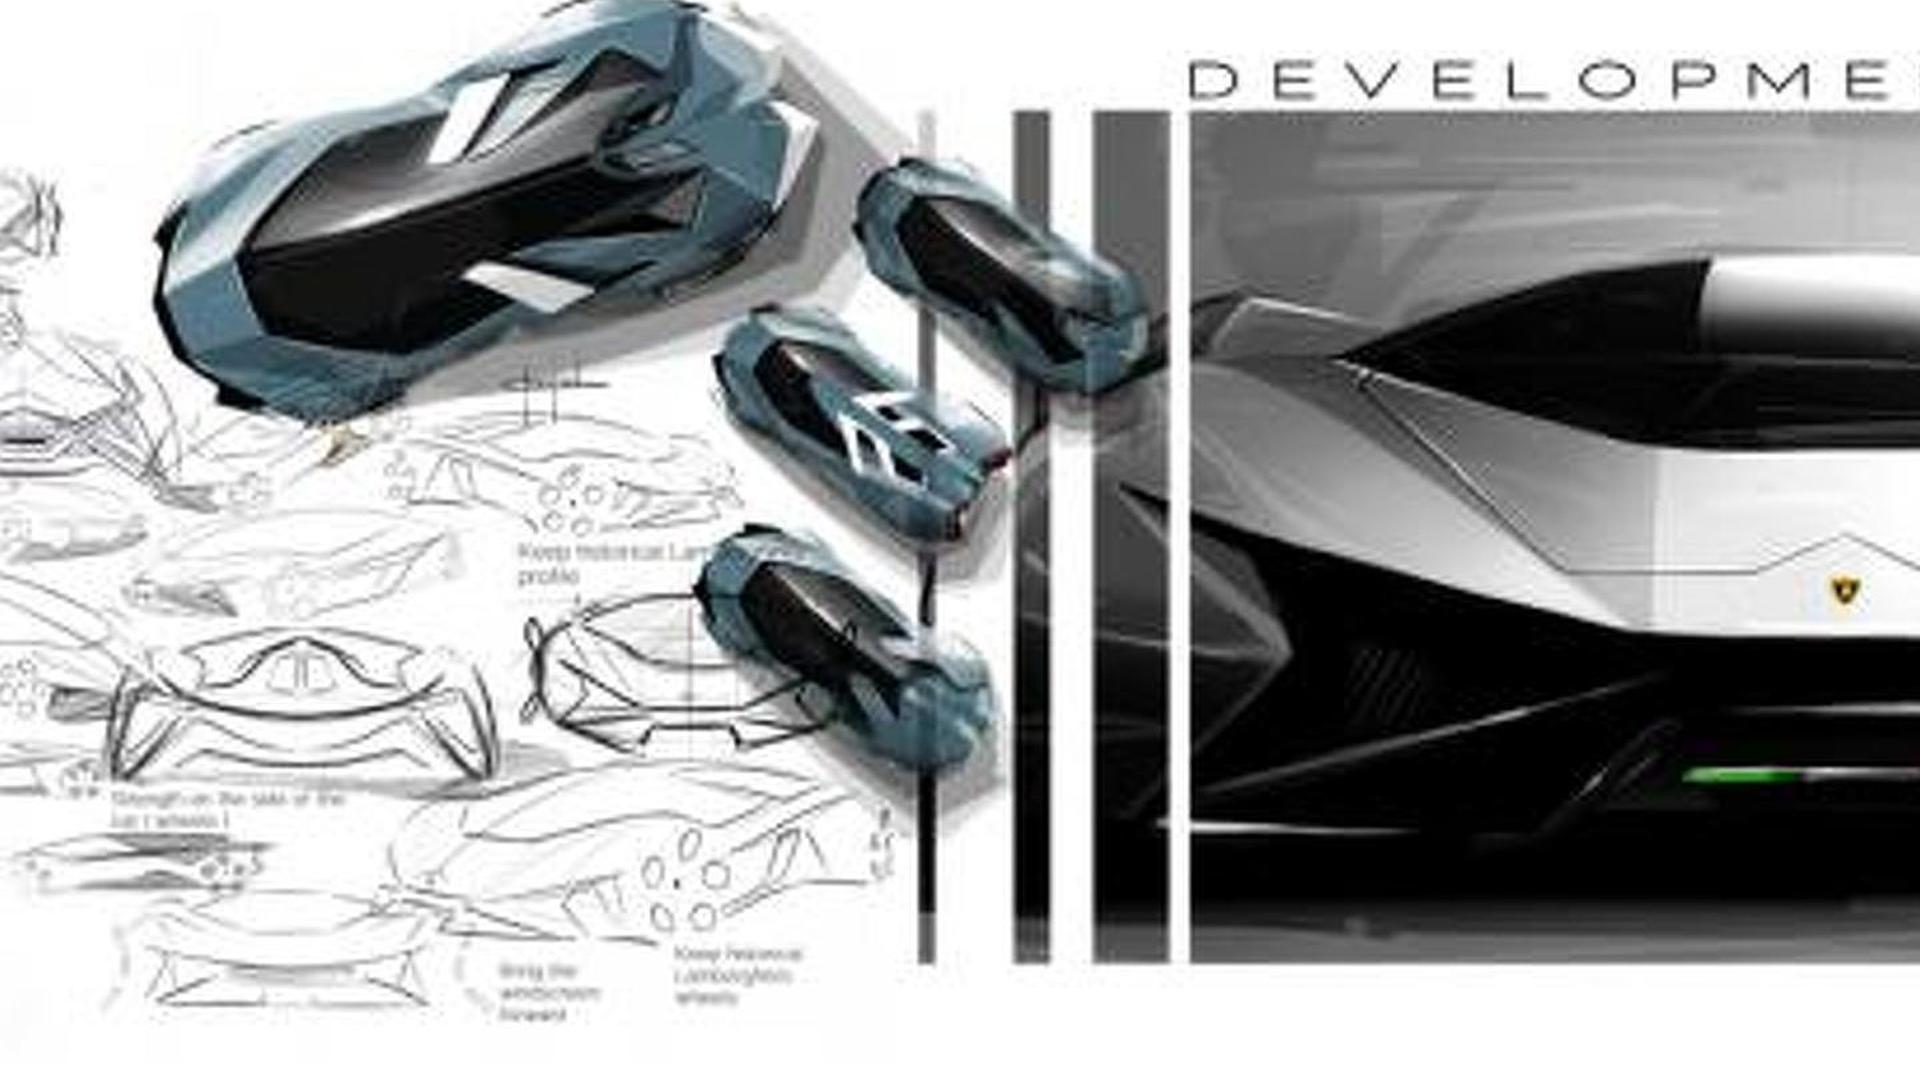 Lamborghini Diamante concept artist rendering for the year 2023 [video]